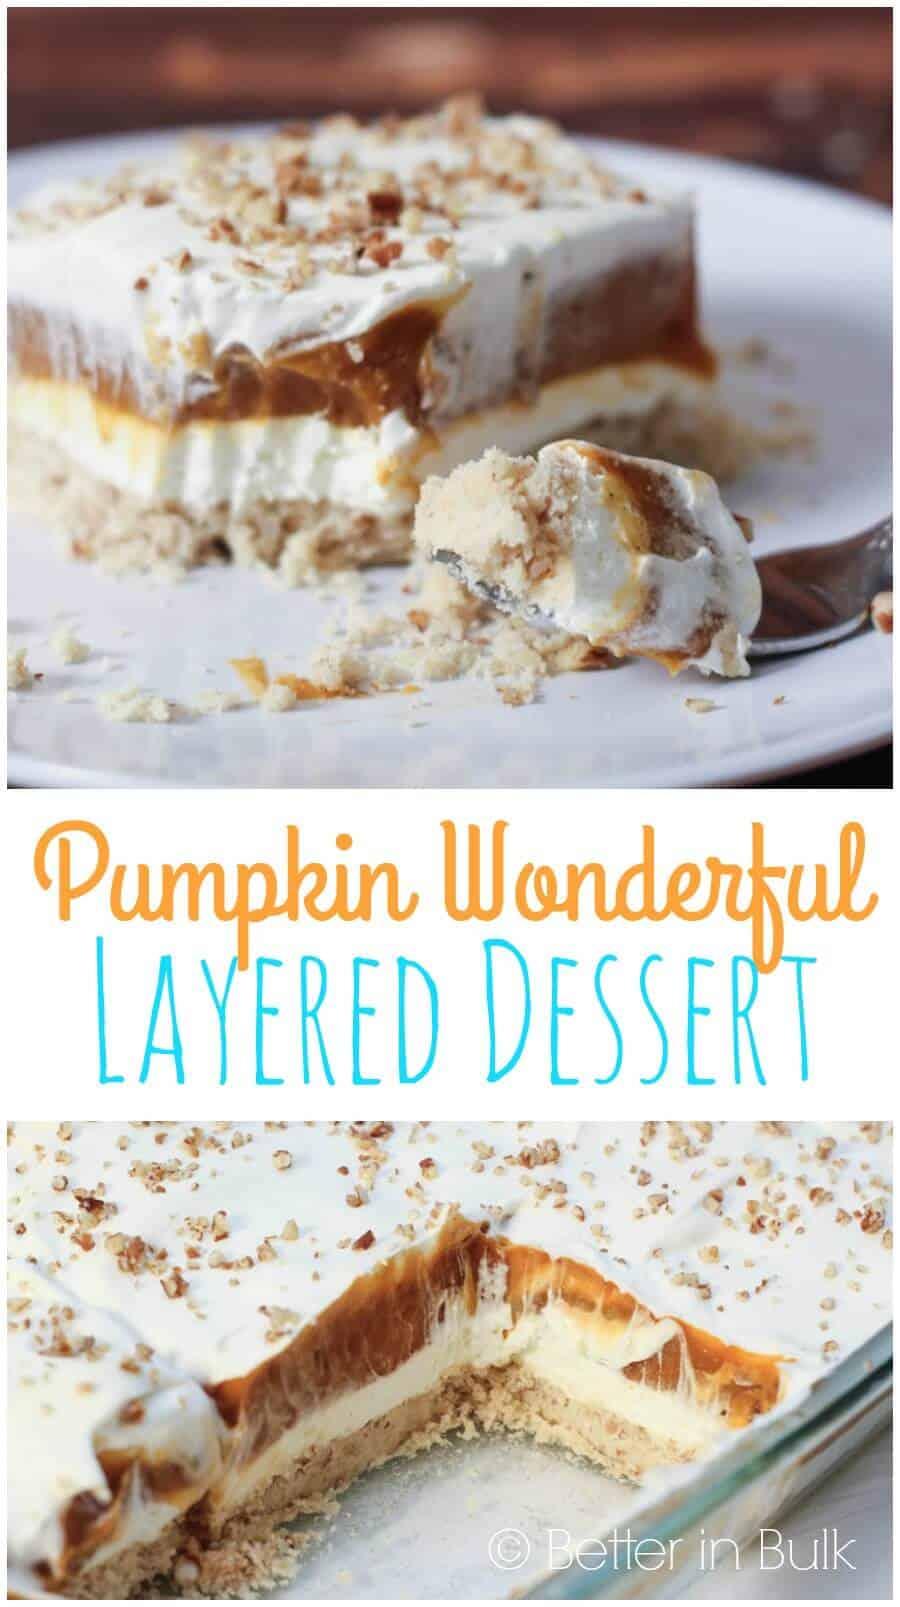 Pumpkin Wonderful layered dessert